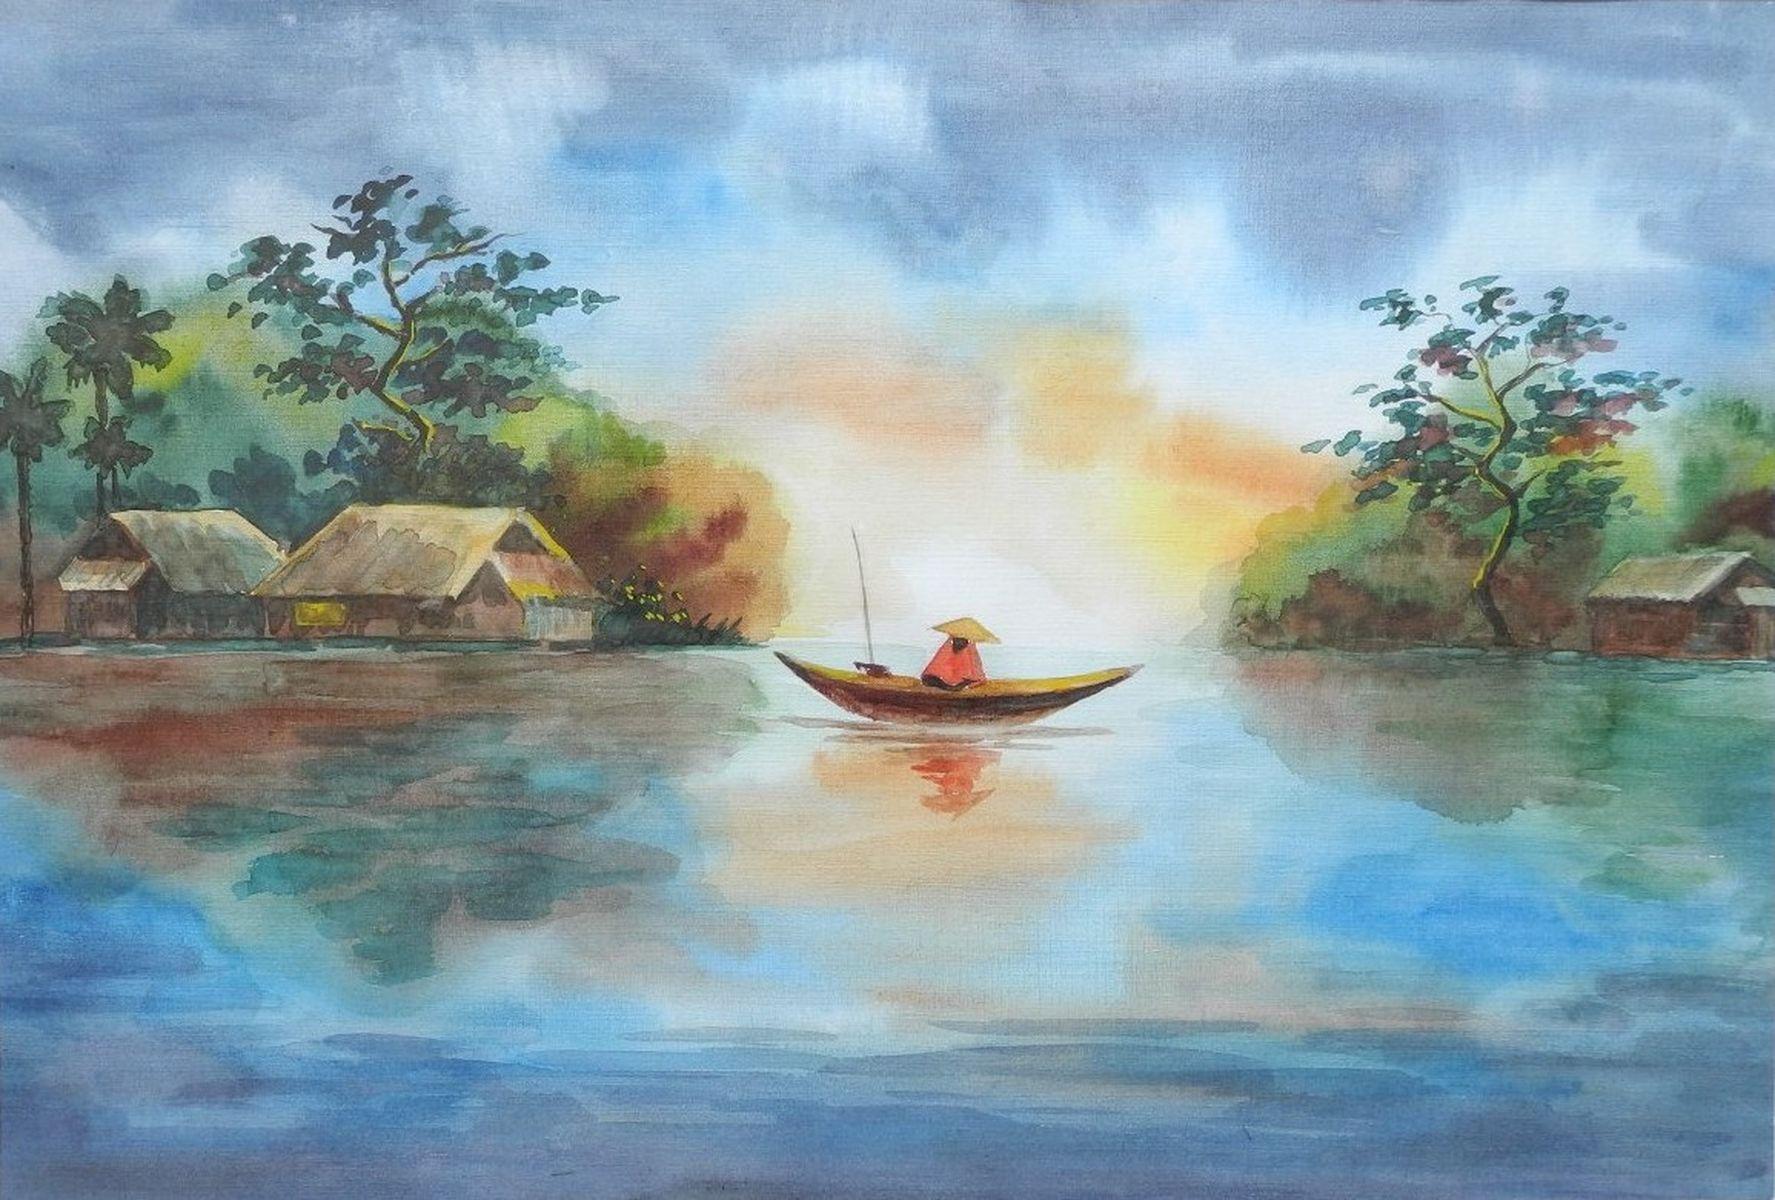 20496922-SvetlanaLatysheva_Fishing_Watercolor_9.8x14.2_300.jpg